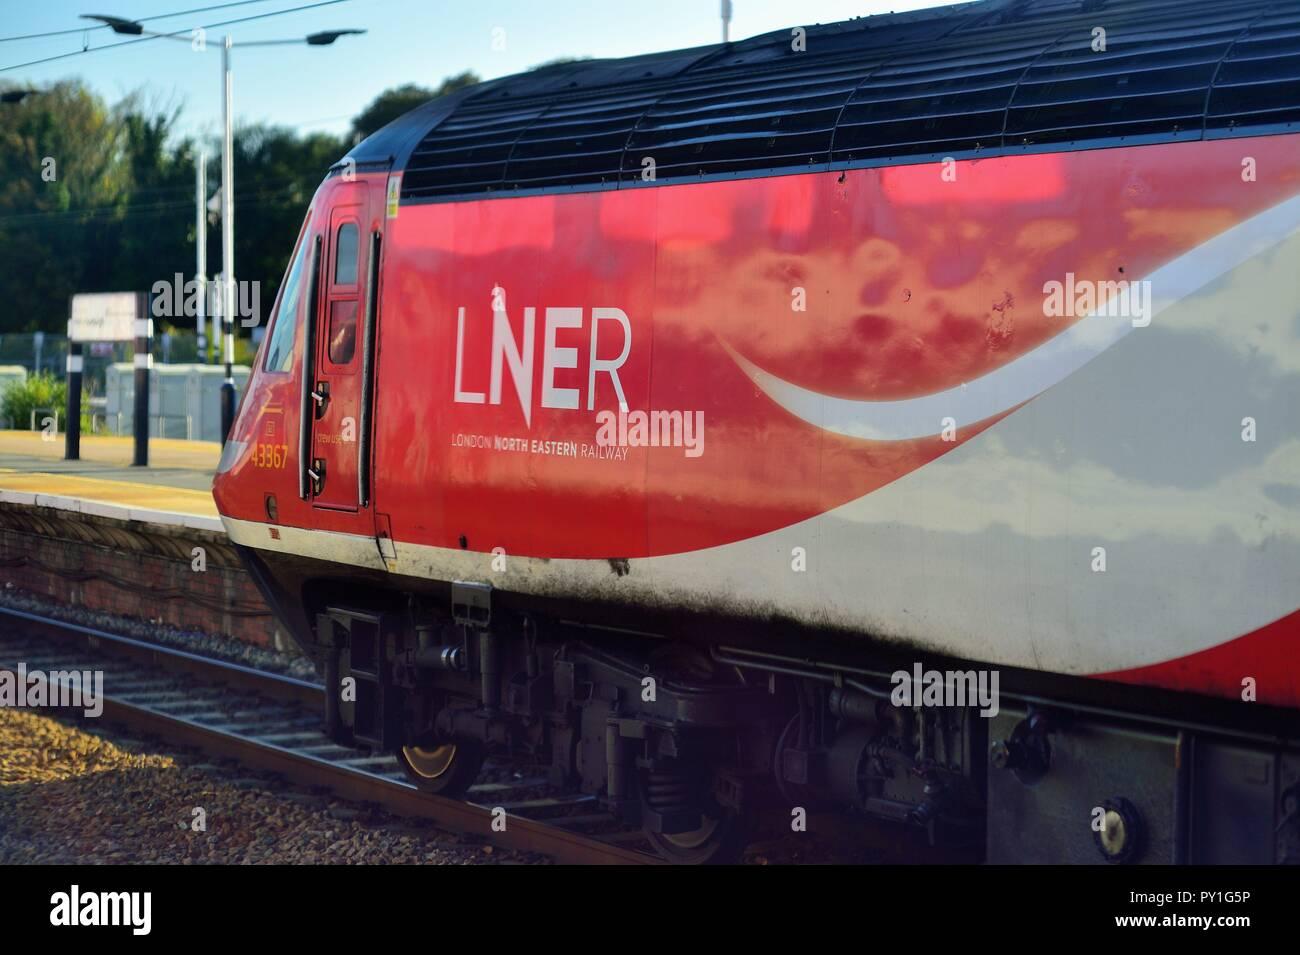 York, England, United Kingdom. A London North Eastern Railway train, headed by a Class 43 locomotive at York Station. - Stock Image